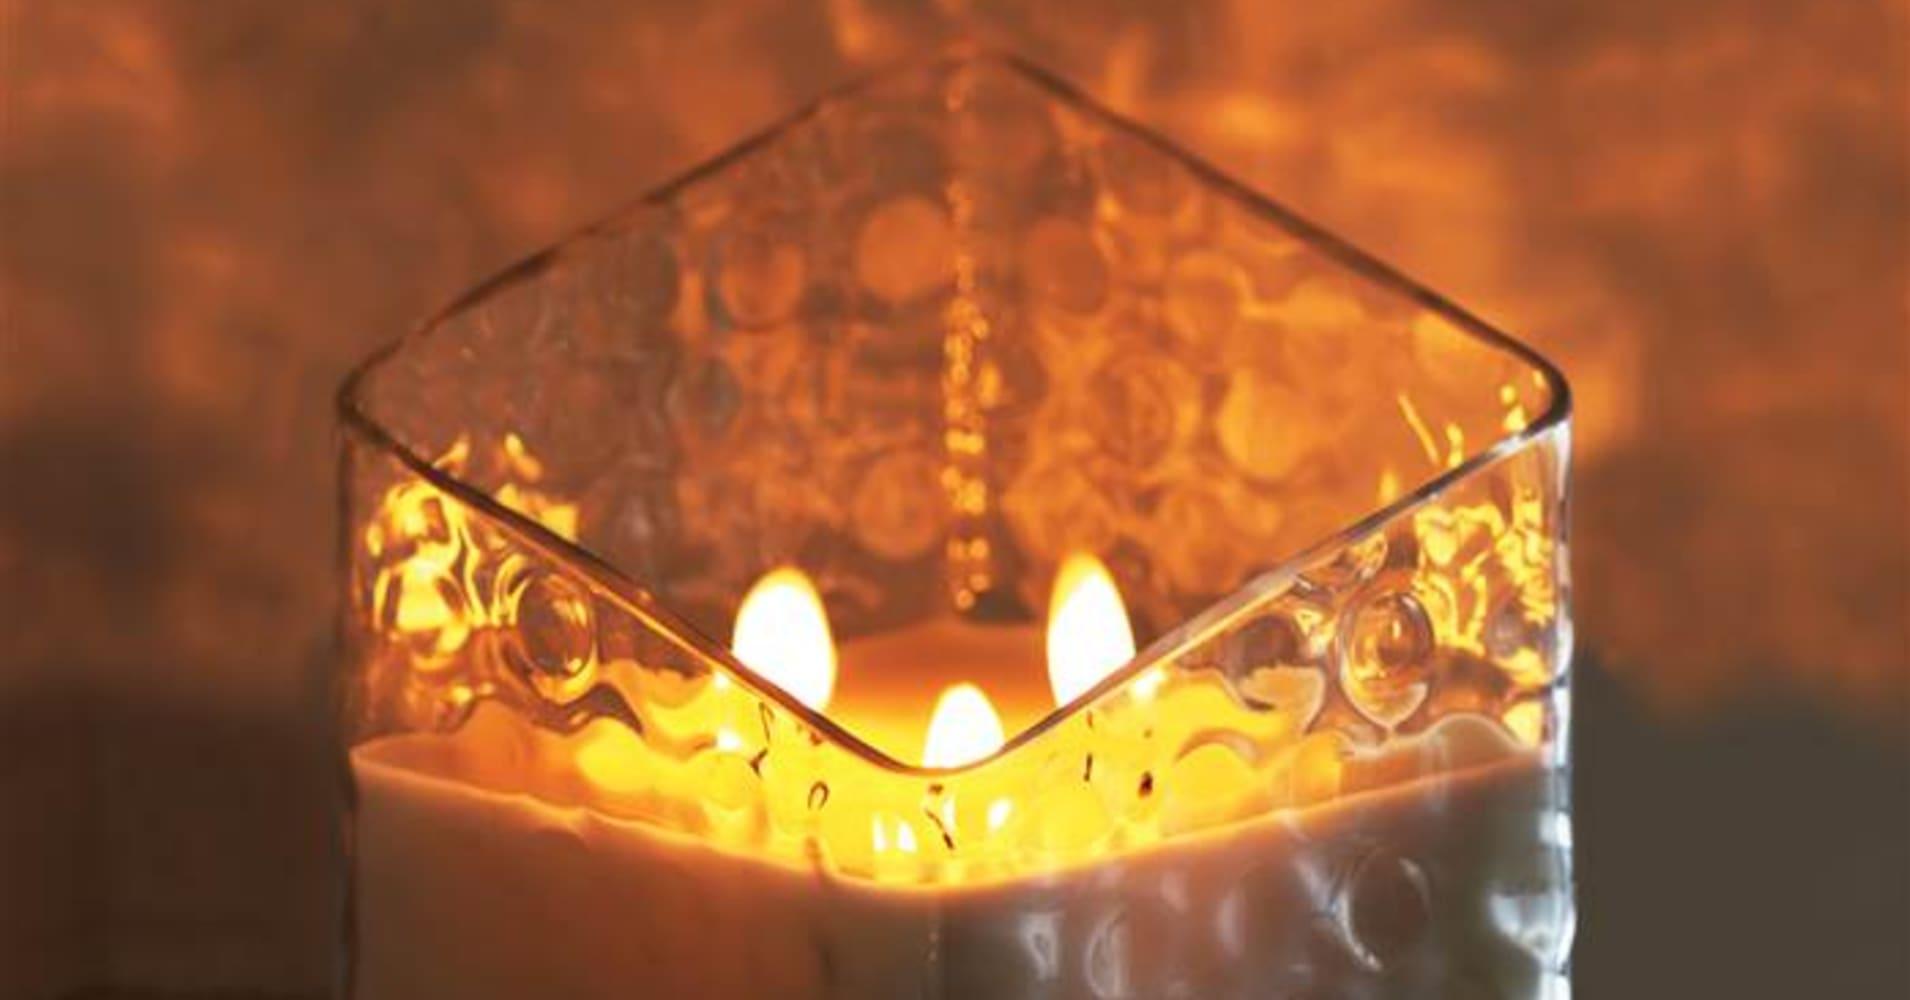 Clarence item Beautiful Silver Crystal 2 face Medium heart Candle Holder ukstock